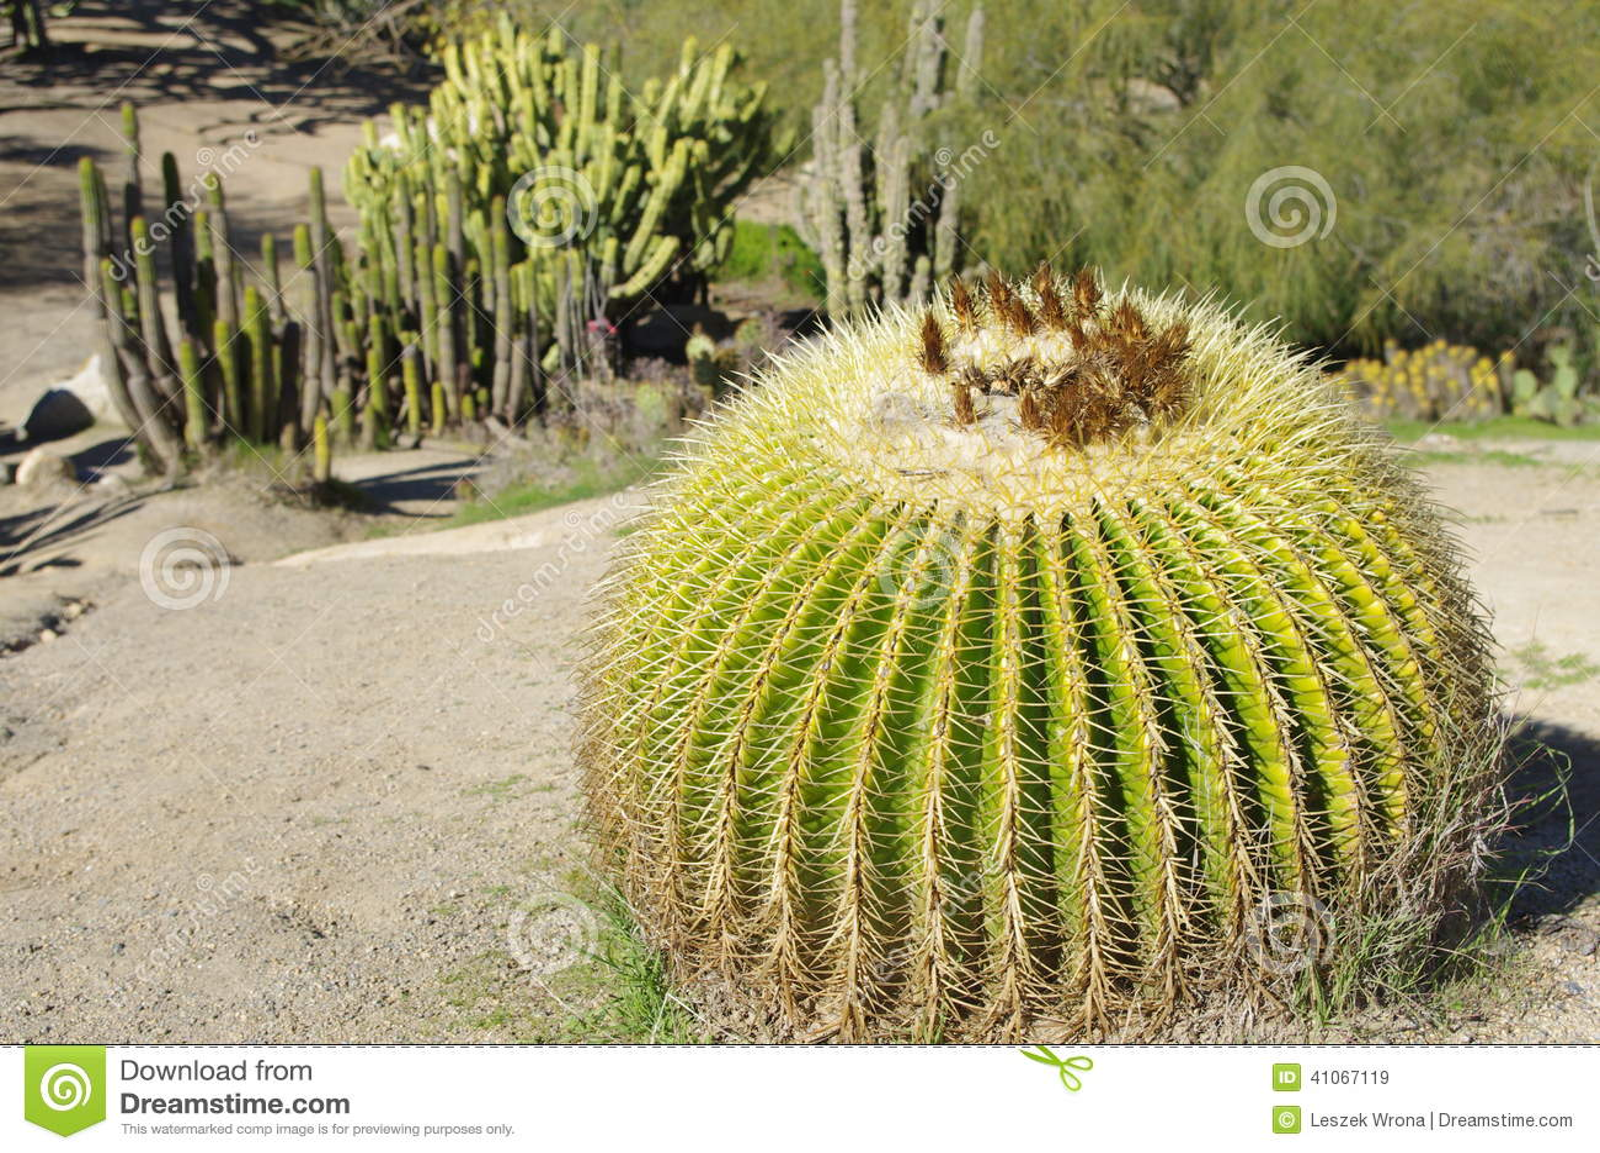 Dry Cactus Garden Stock Image Image Of Cacti Southwestern 41067119 - Cactus-seco